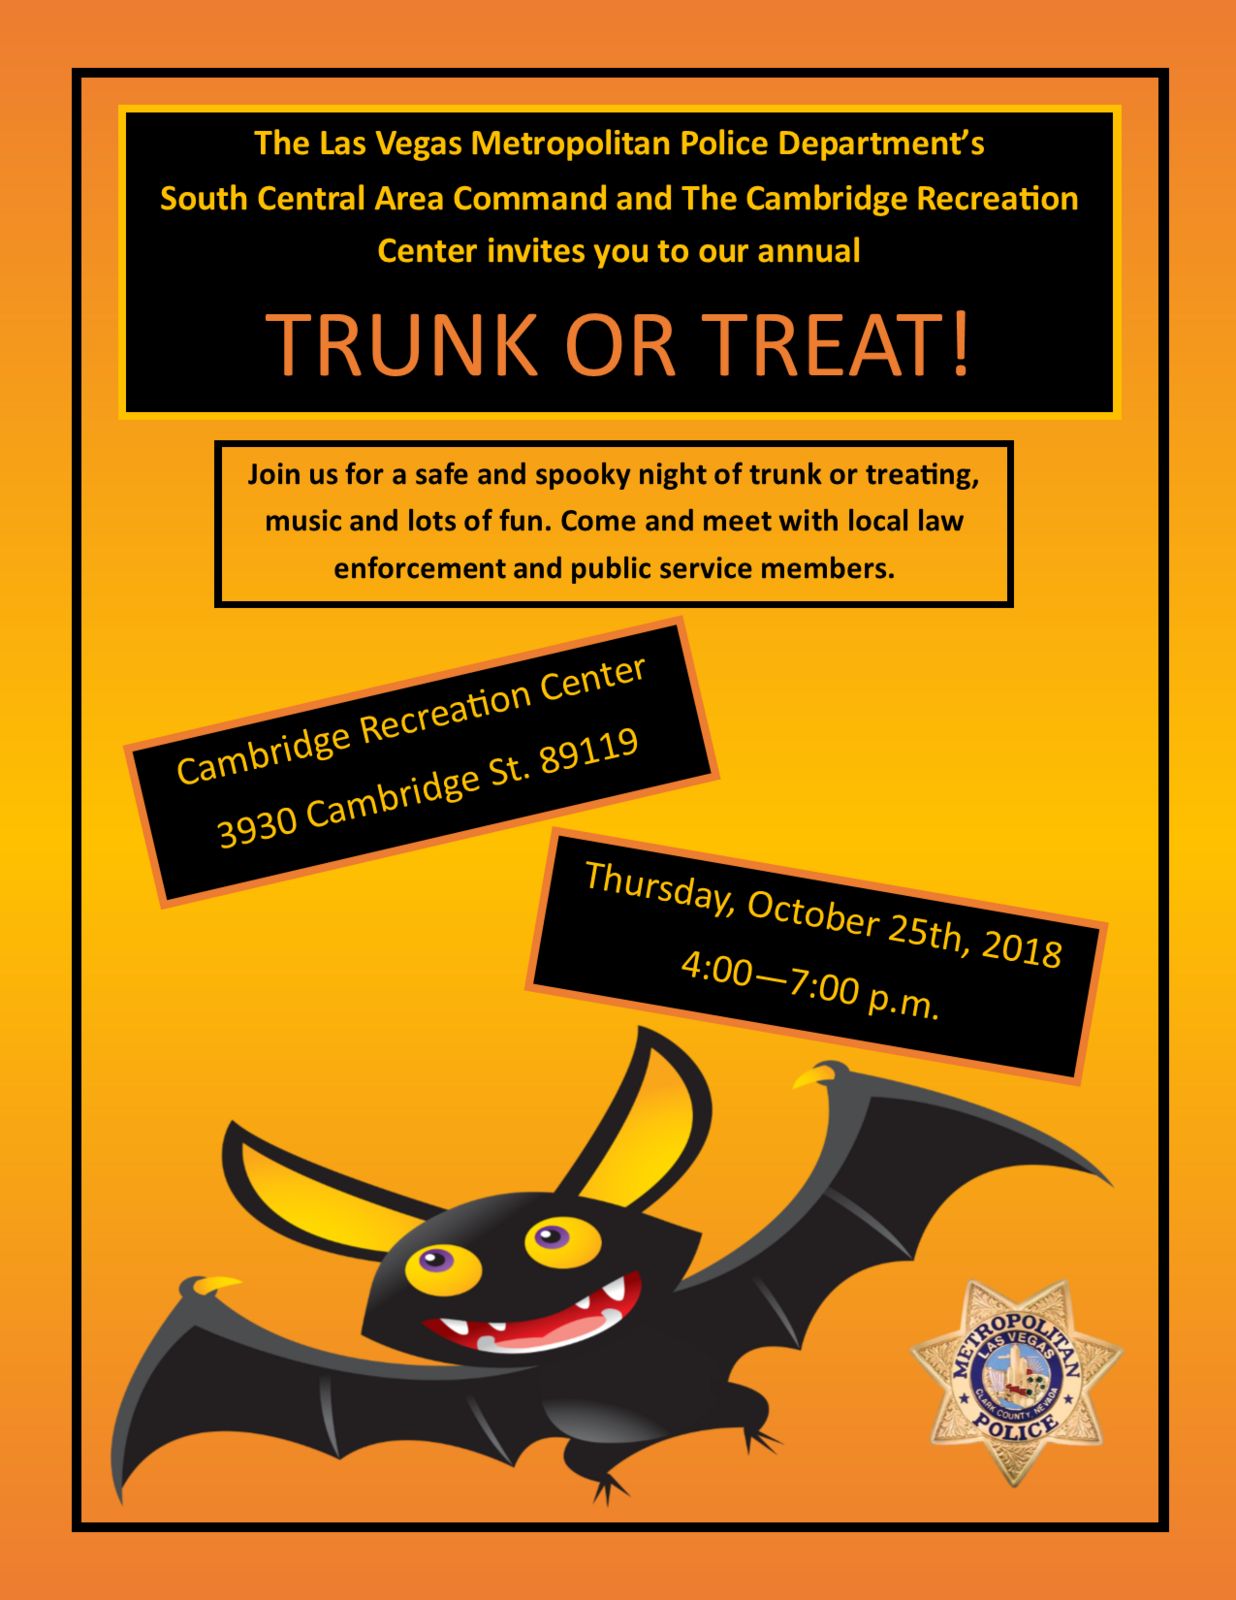 TRUNK OR TREAT!! (Las Vegas Metropolitan Police Department